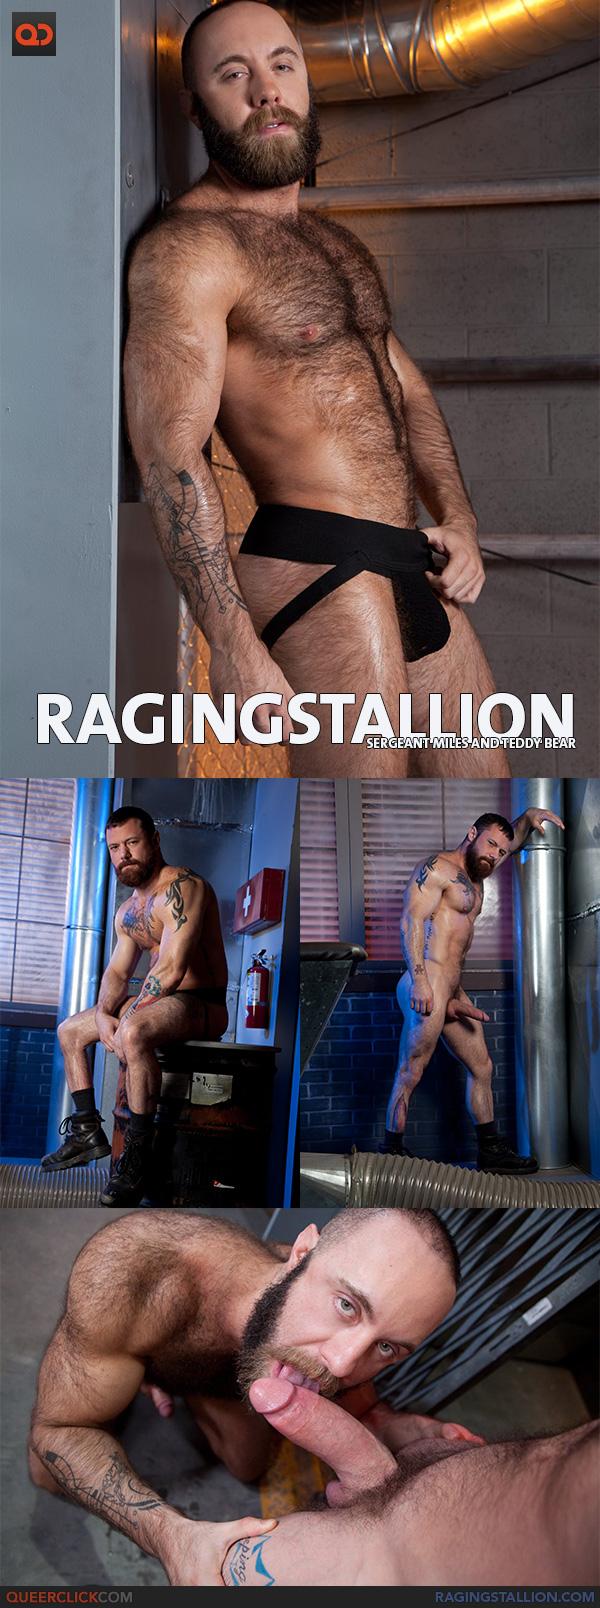 Raging Stallion: Sergeant Miles and Teddy Bear